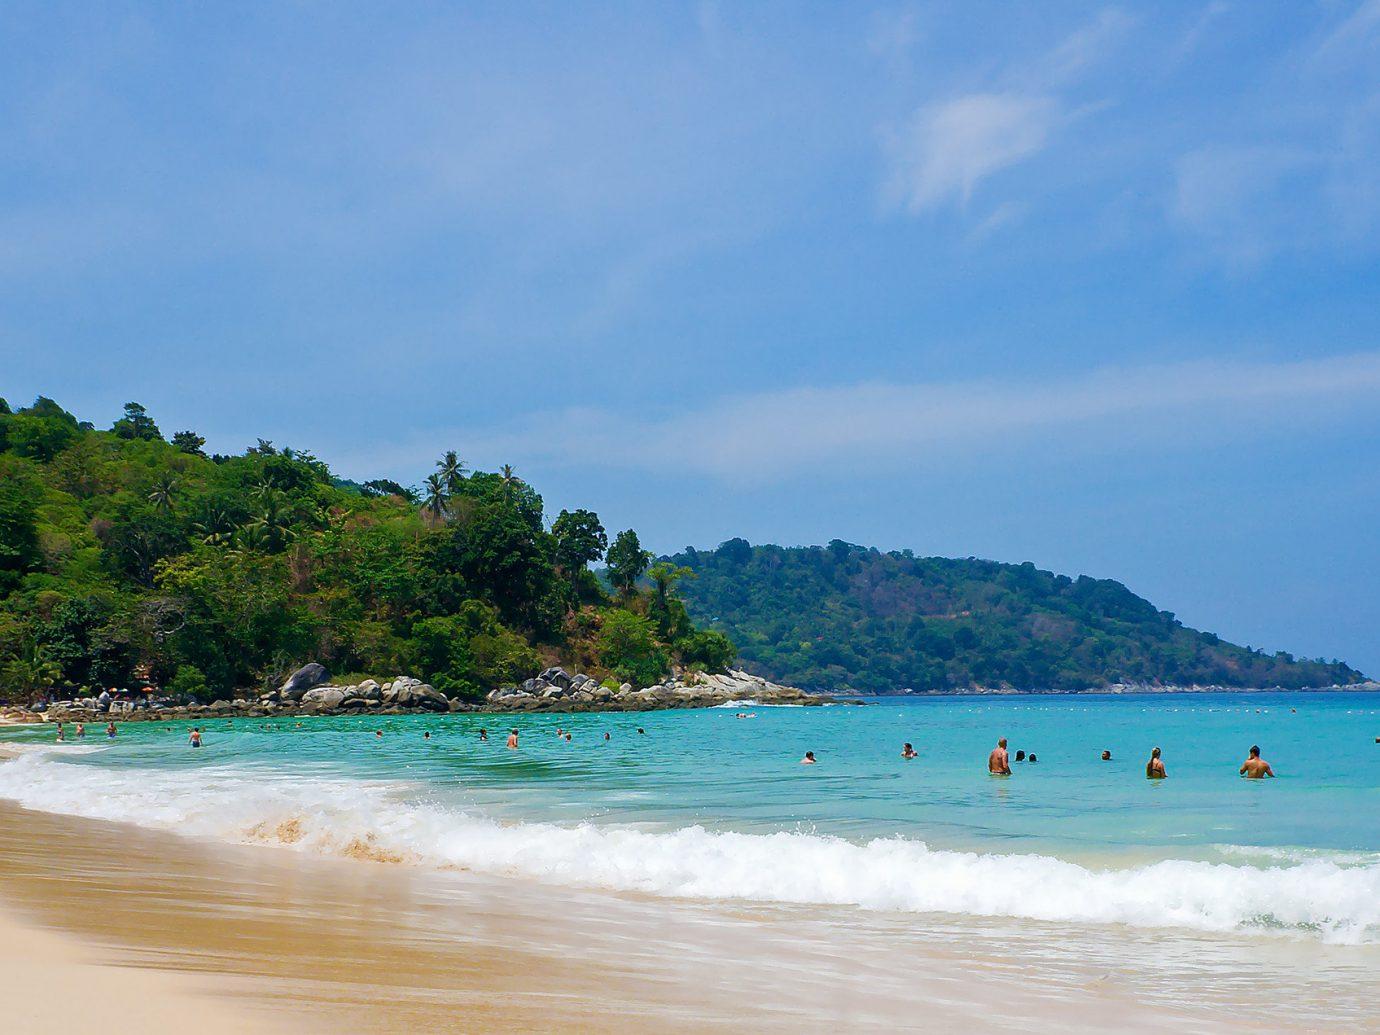 Kata Noi Beach, Phuket, Trip Ideas water sky outdoor Beach Nature body of water shore Sea Ocean Coast people vacation caribbean bay wind wave tropics wave Island cape cove swimming day sandy